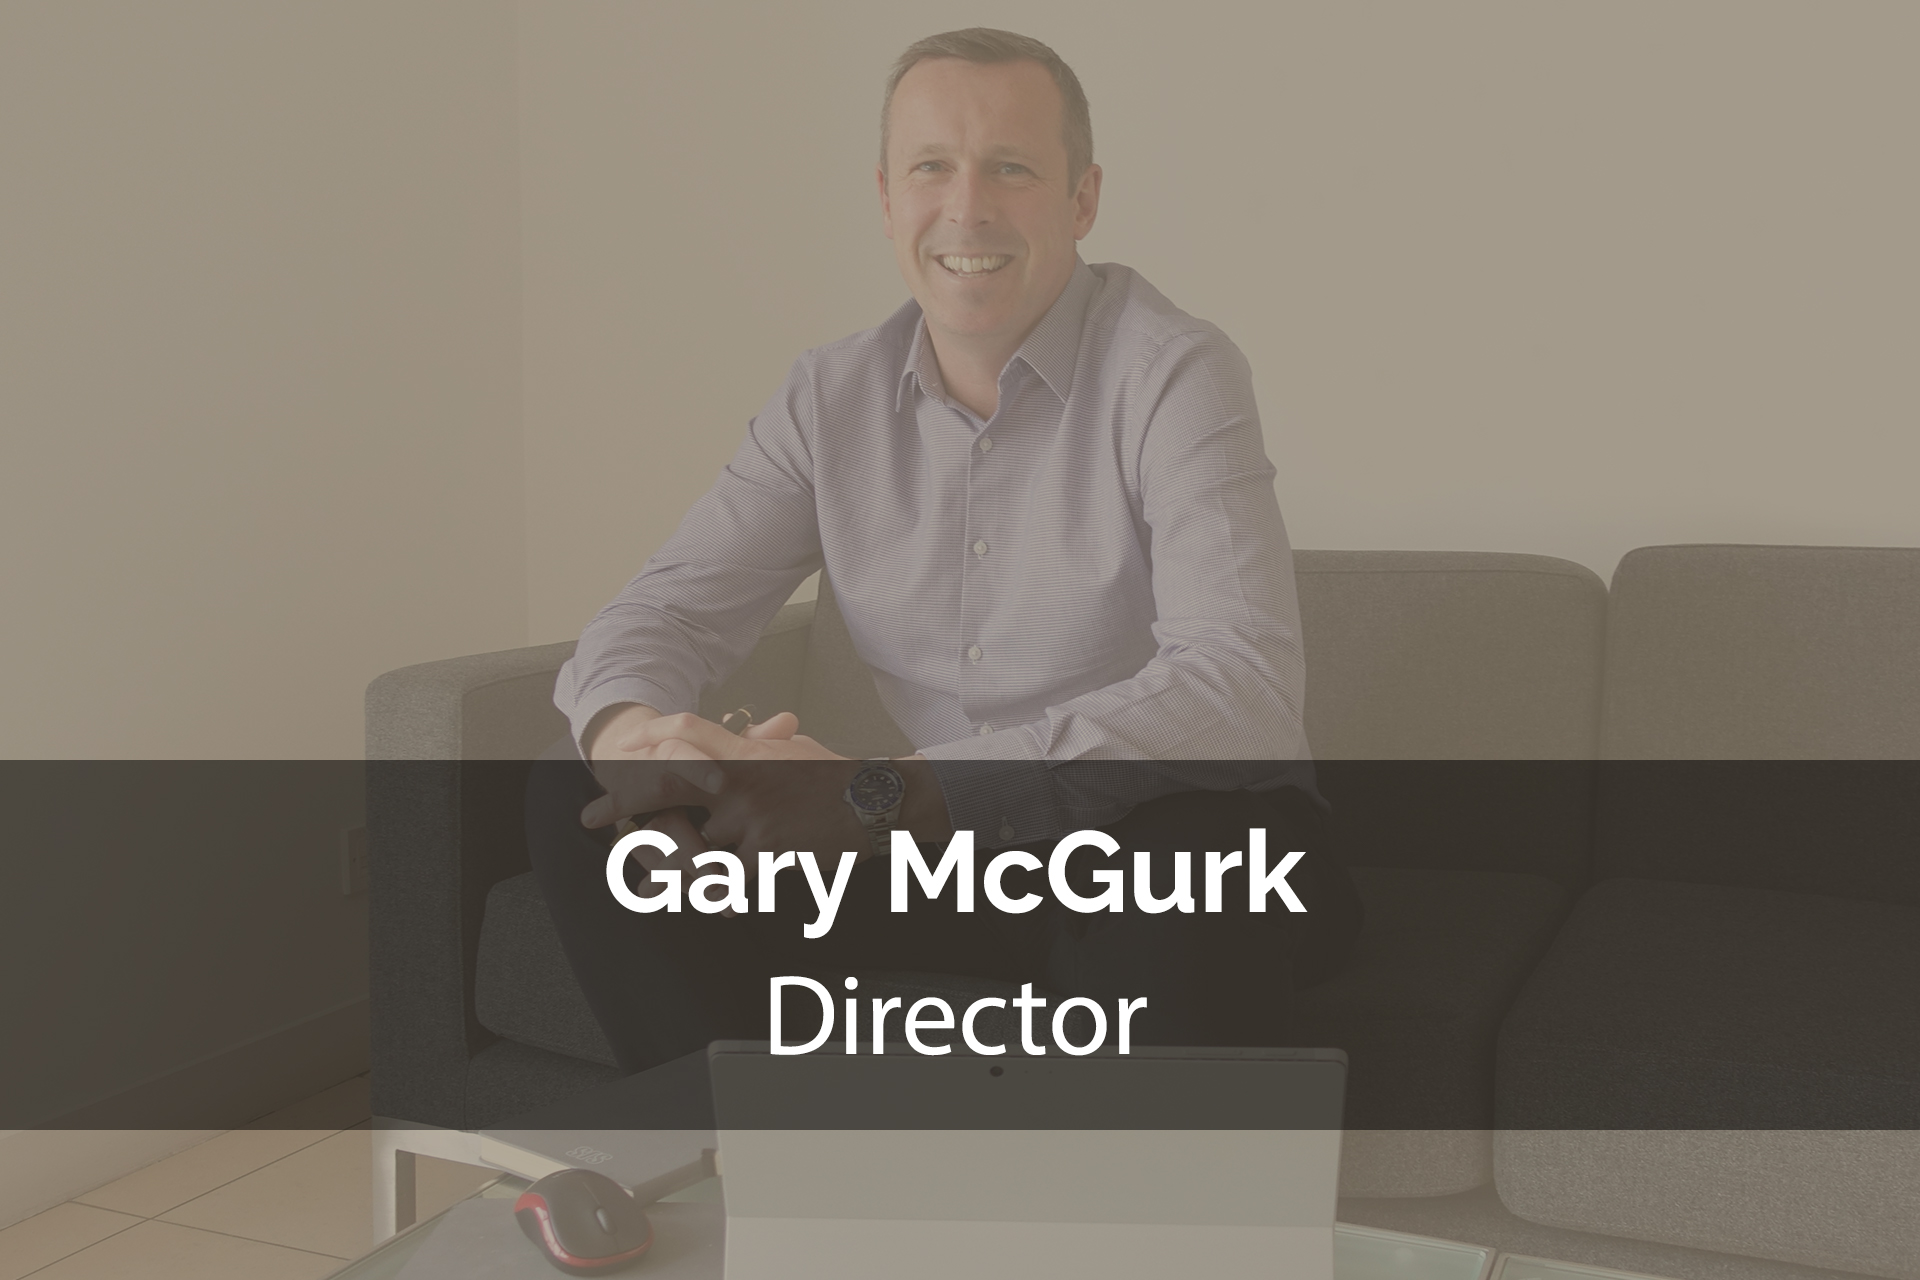 Gary McGurk